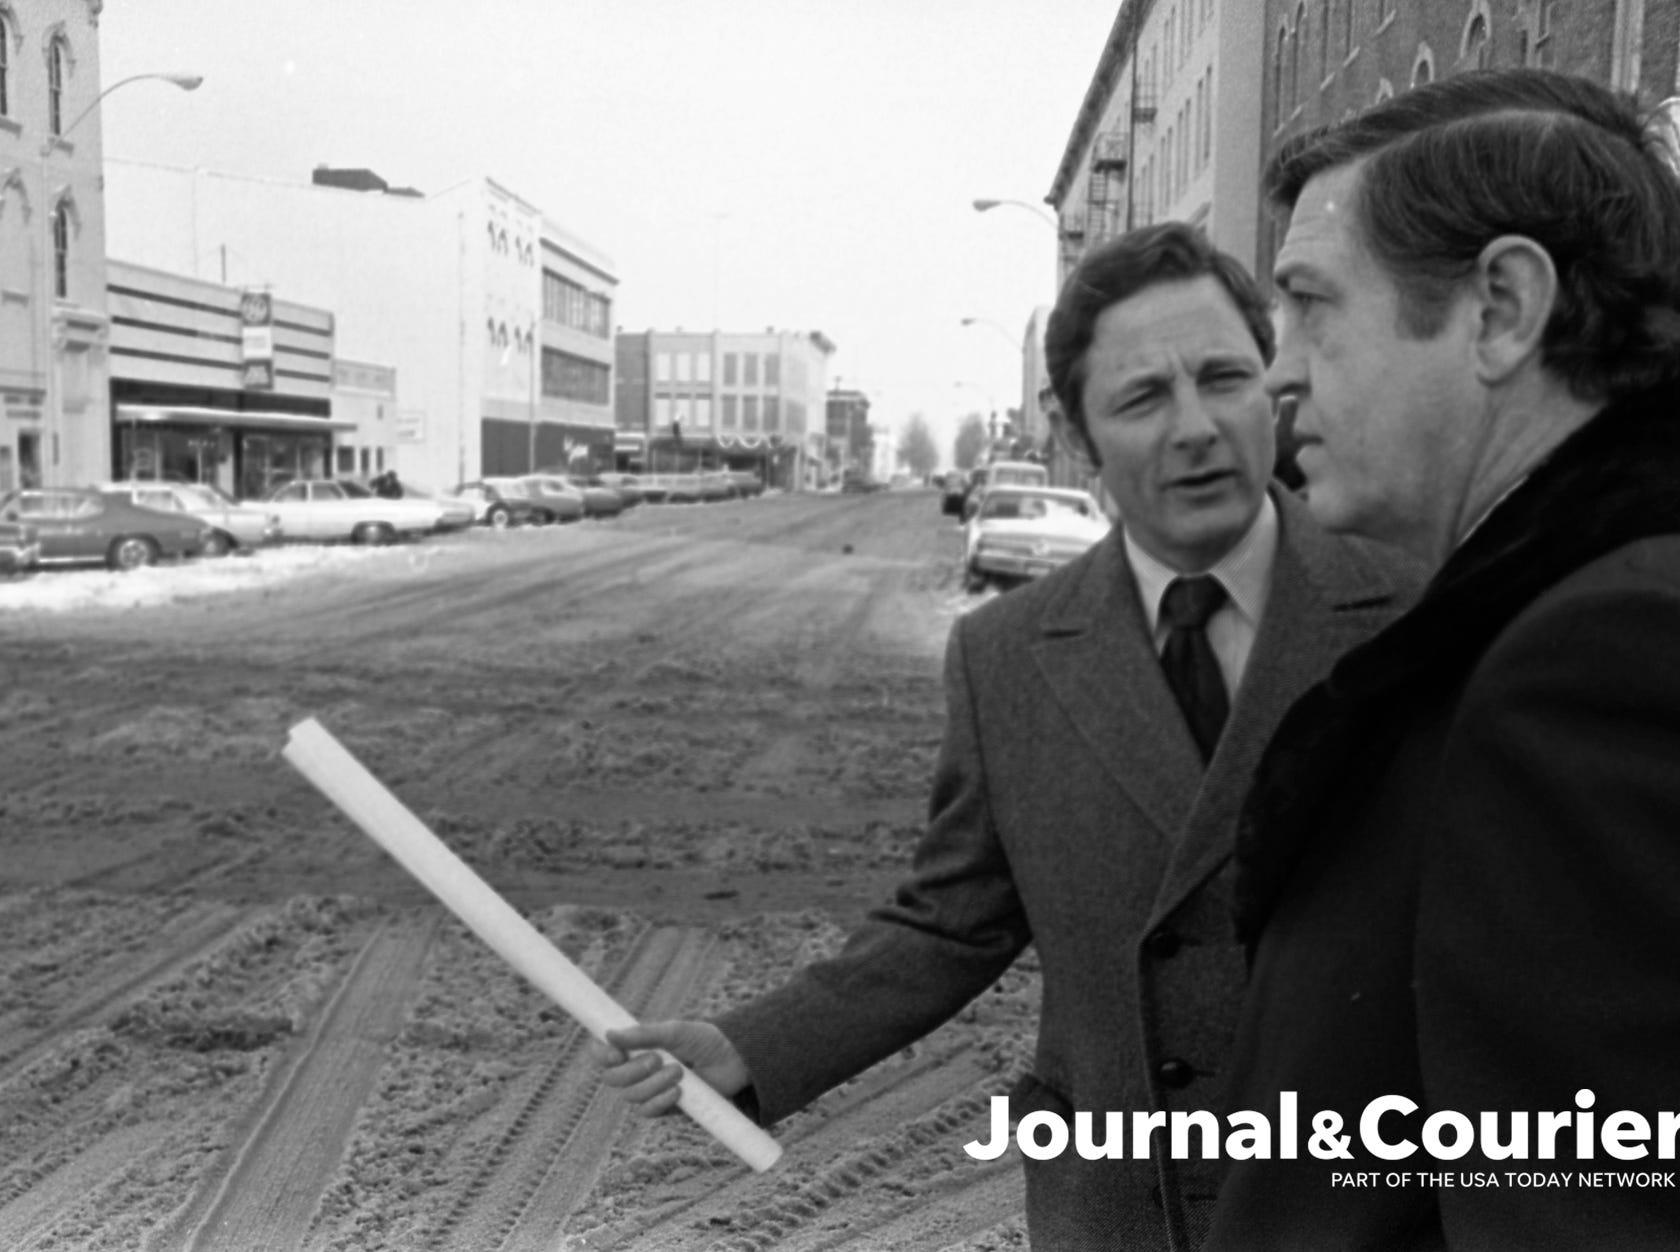 U.S Senator Birch Bayh discusses Railroad Relocation wiht Lafayette mayor Jim Riehle on Fifth Street. Photo taken Jan. 12, 1974.